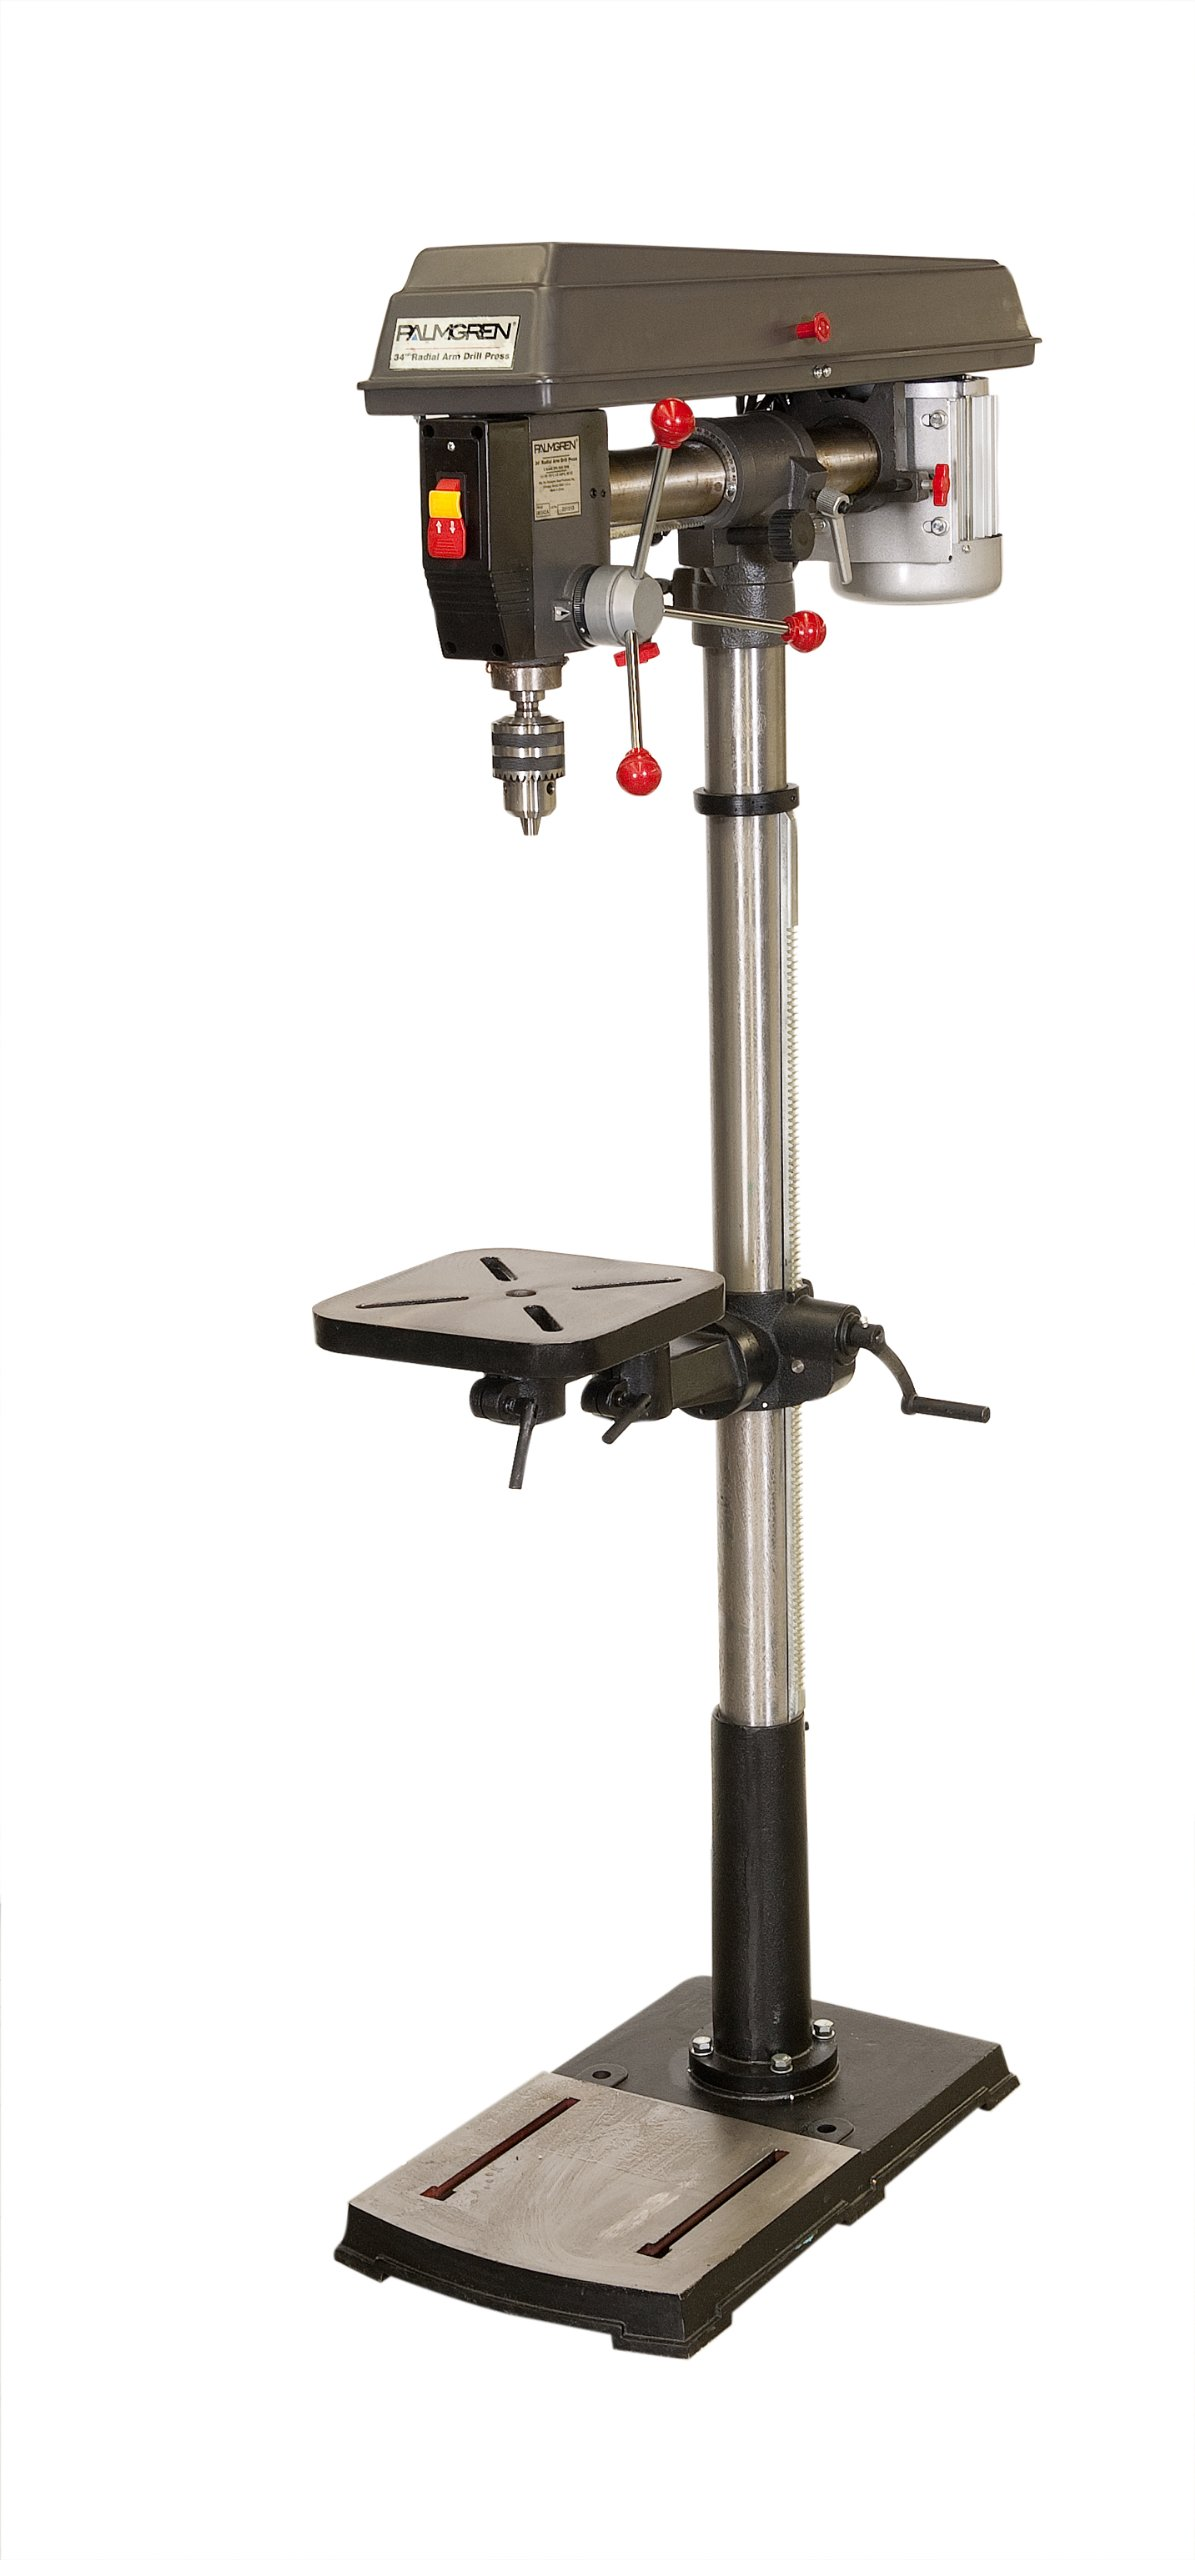 Palmgren Radial Arm - 5 Speed Floor step pulley